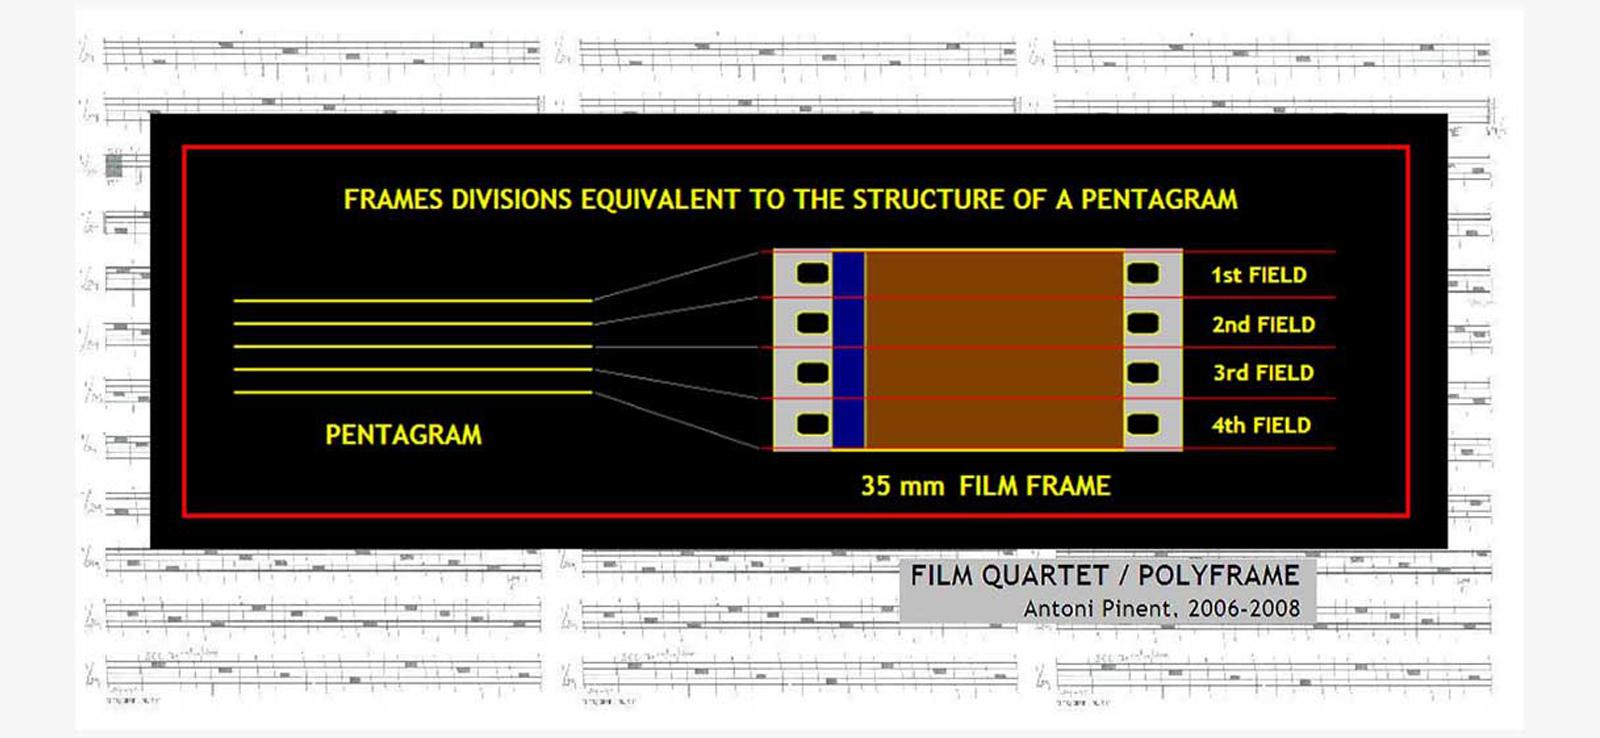 Antoni-Pinent-KINOSTURM-KUBELKA-16-variaciones-film-artist-mutations